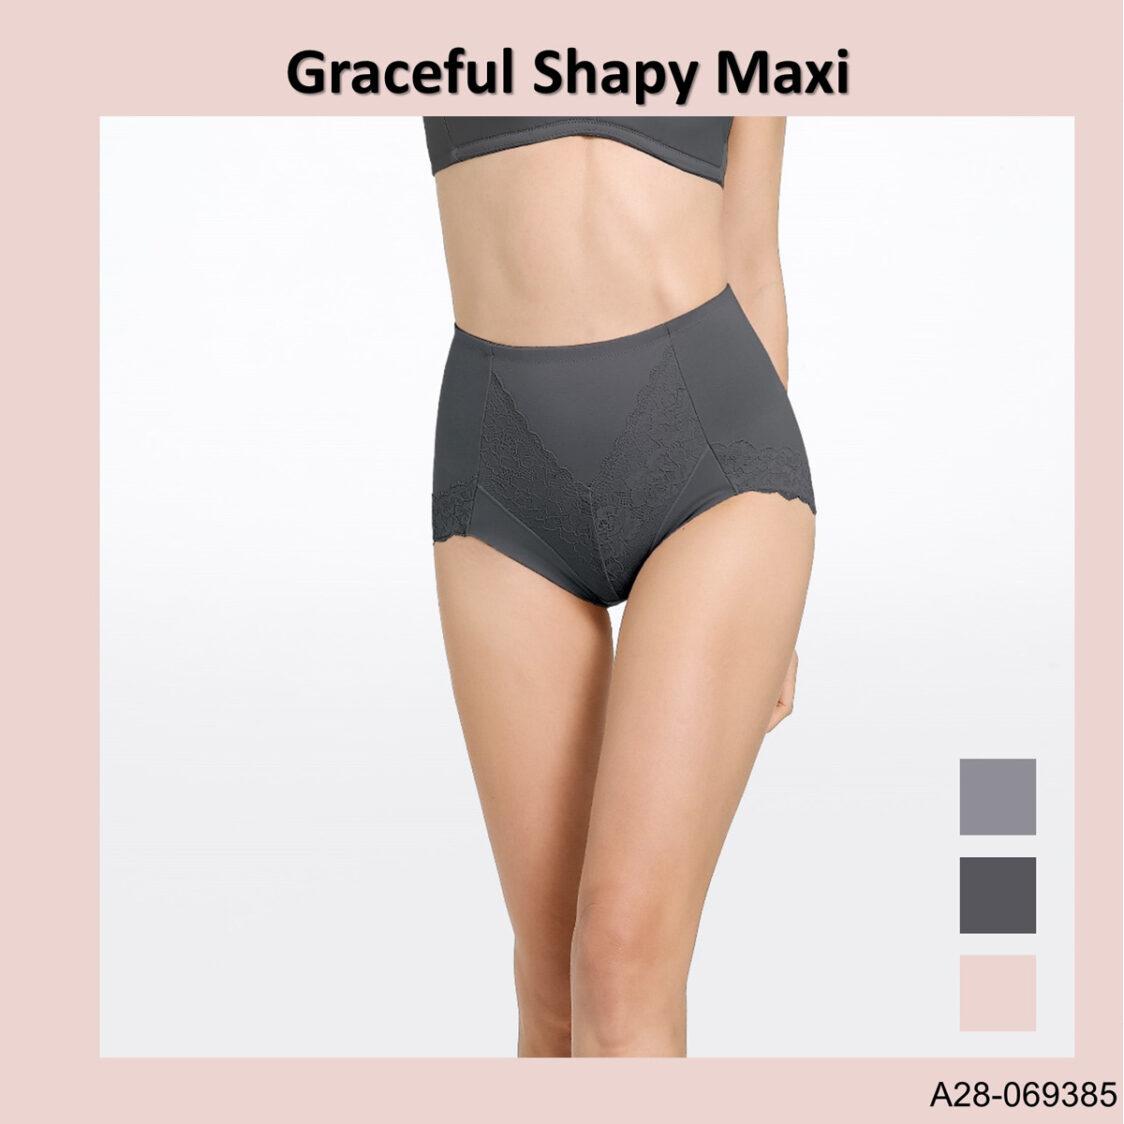 Graceful Shapy Maxi A28-069385LGY Light Grey